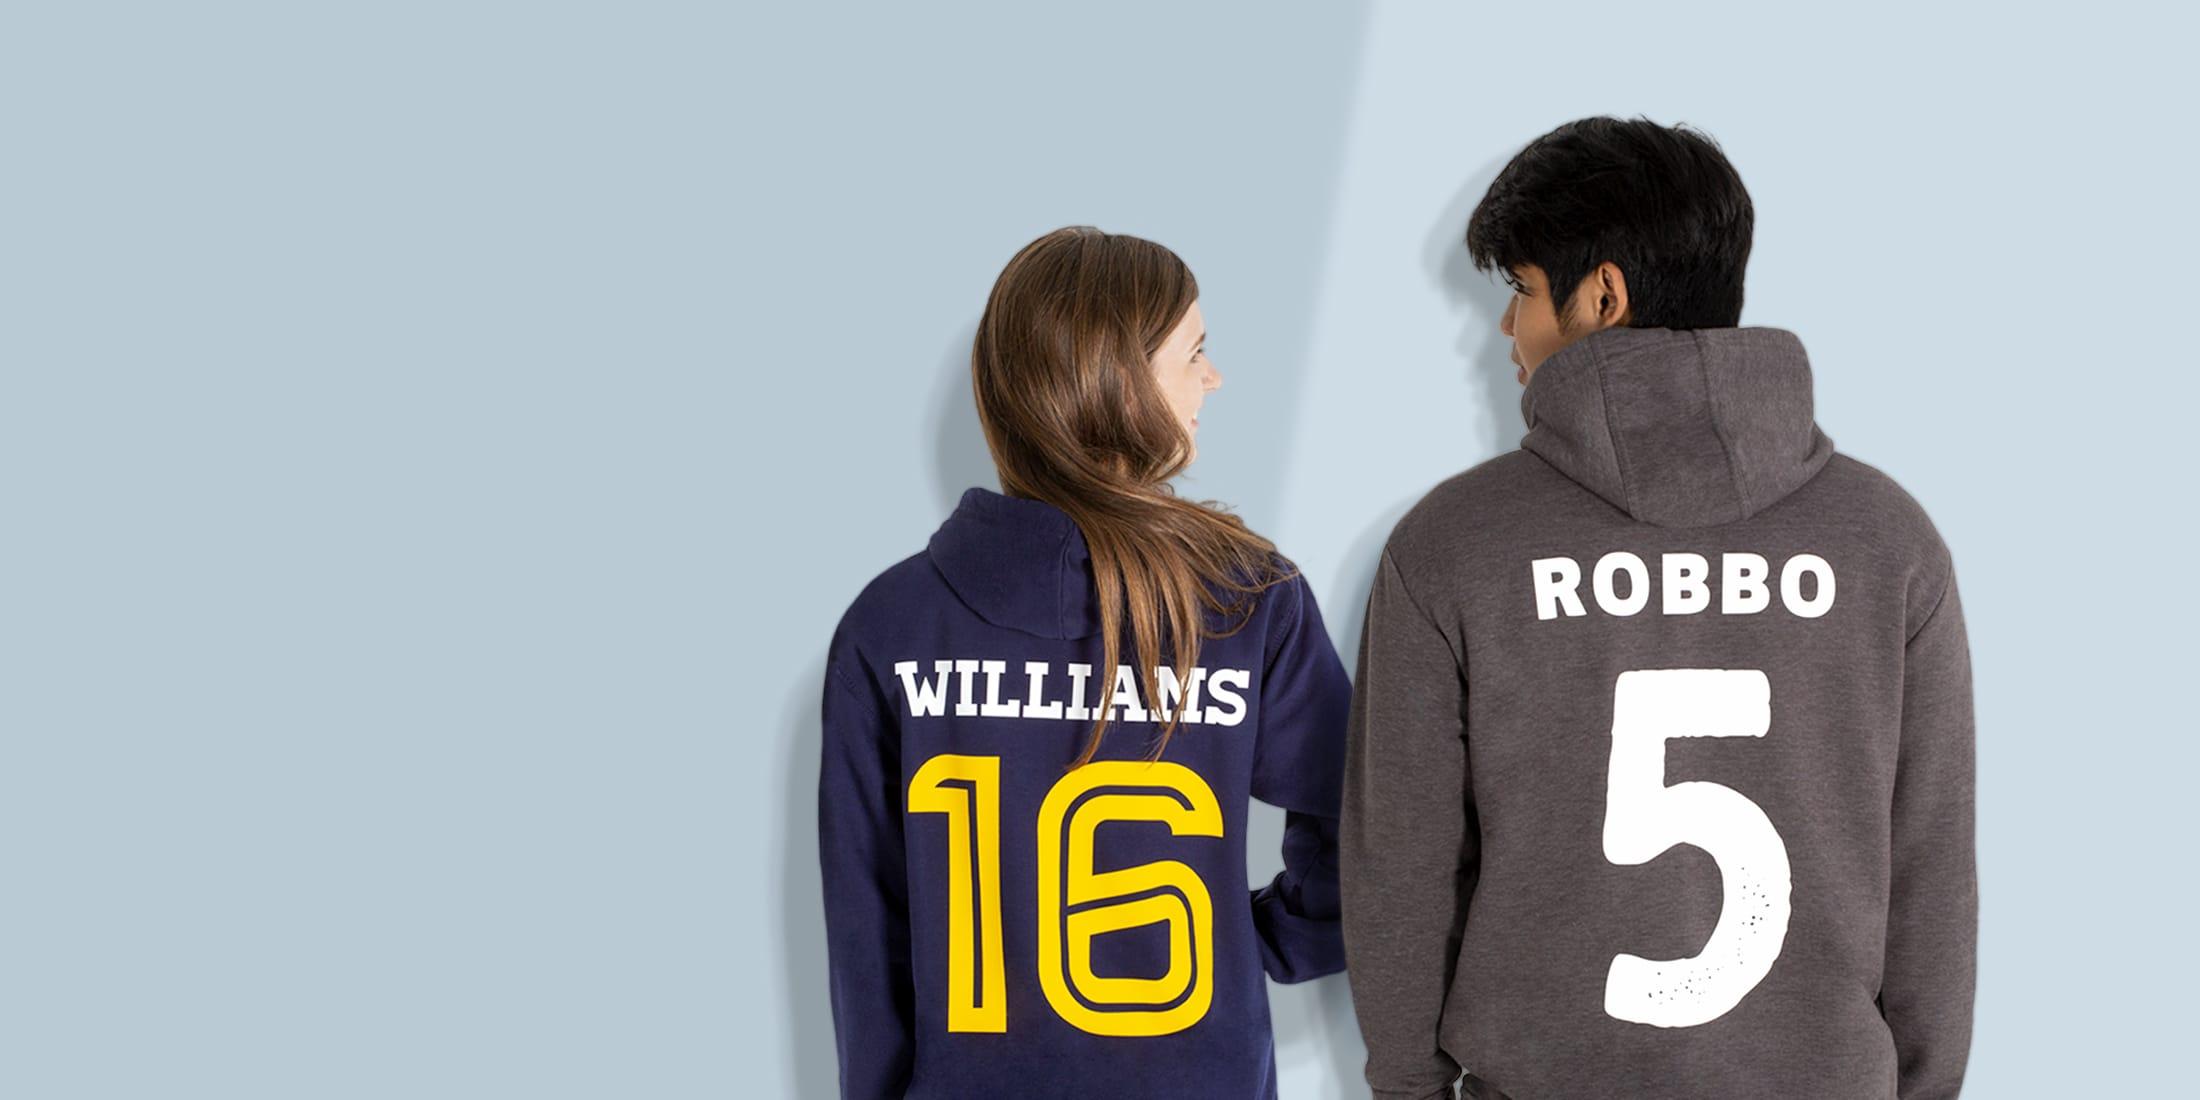 Ski trip hoodies personalised with logos, names and numbers